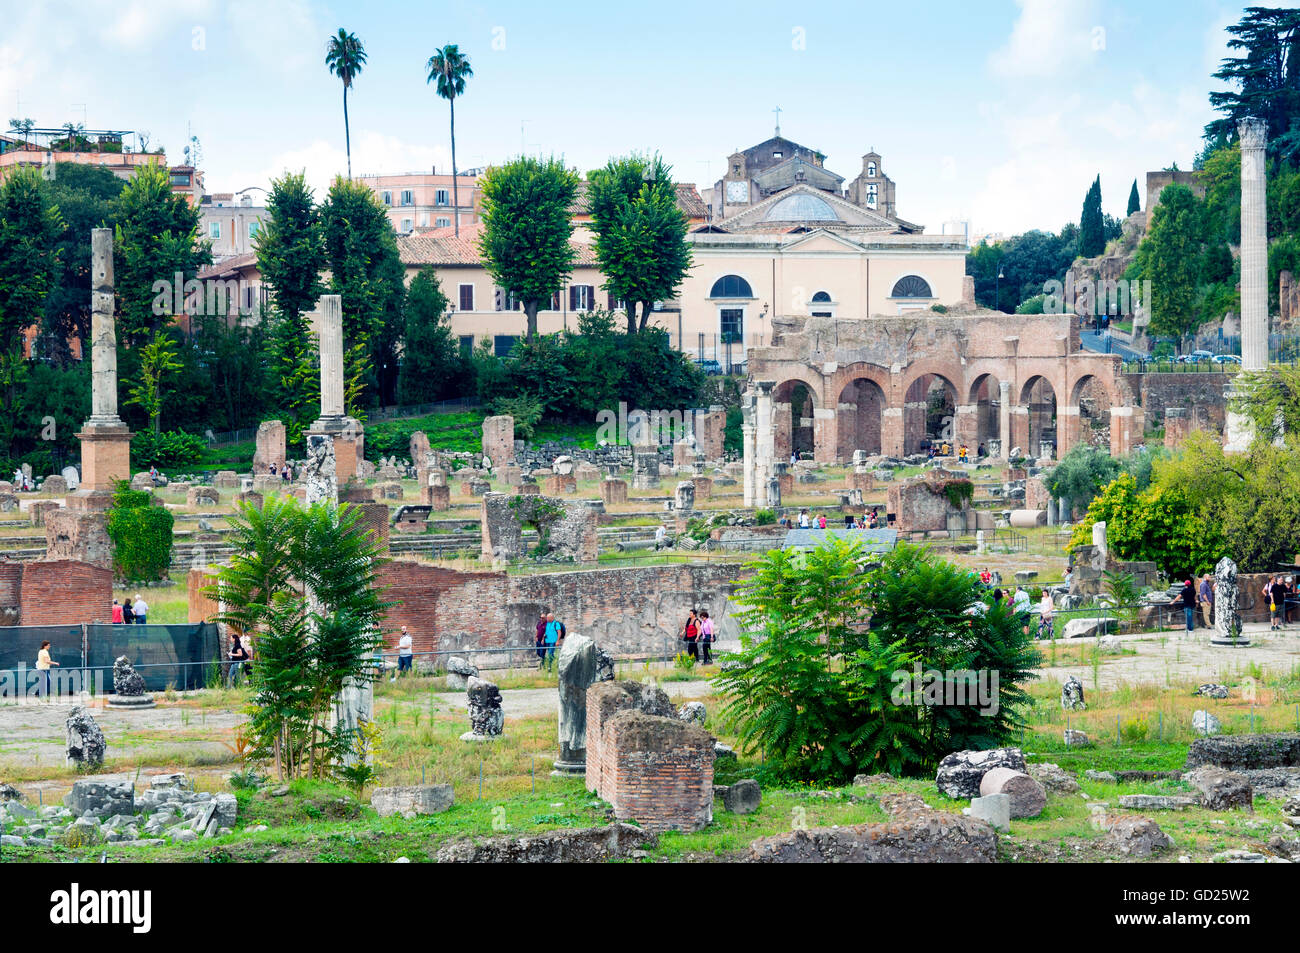 Forum of Nerva, Roman Forum (Foro Romano), UNESCO World Heritage Site, Rome, Lazio, Italy, Europe - Stock Image